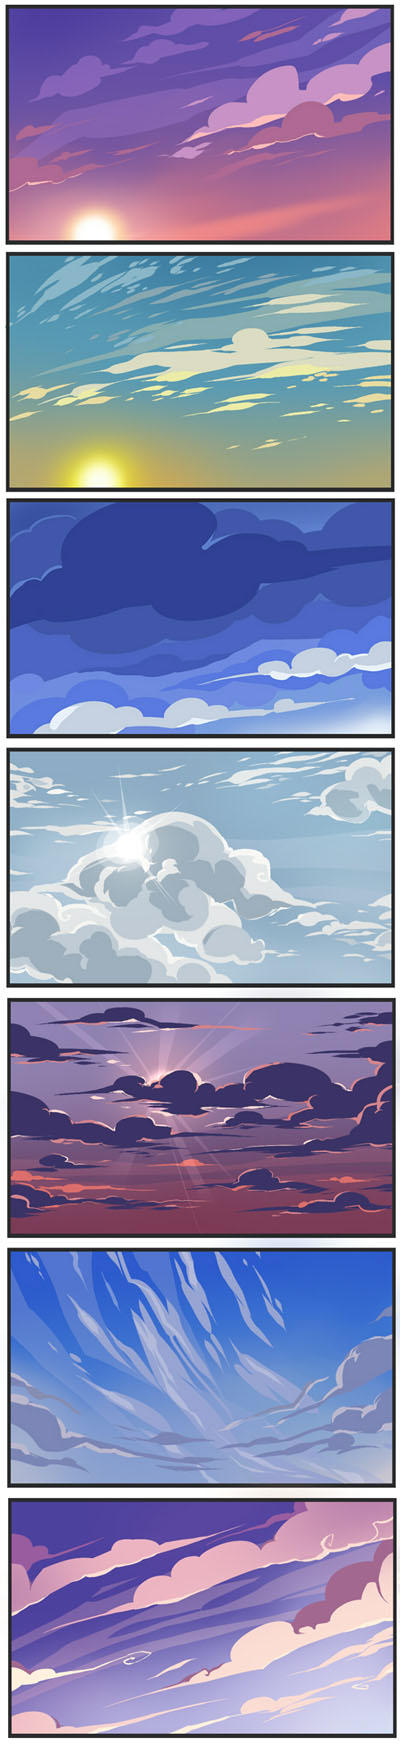 Sky practice by Drkav